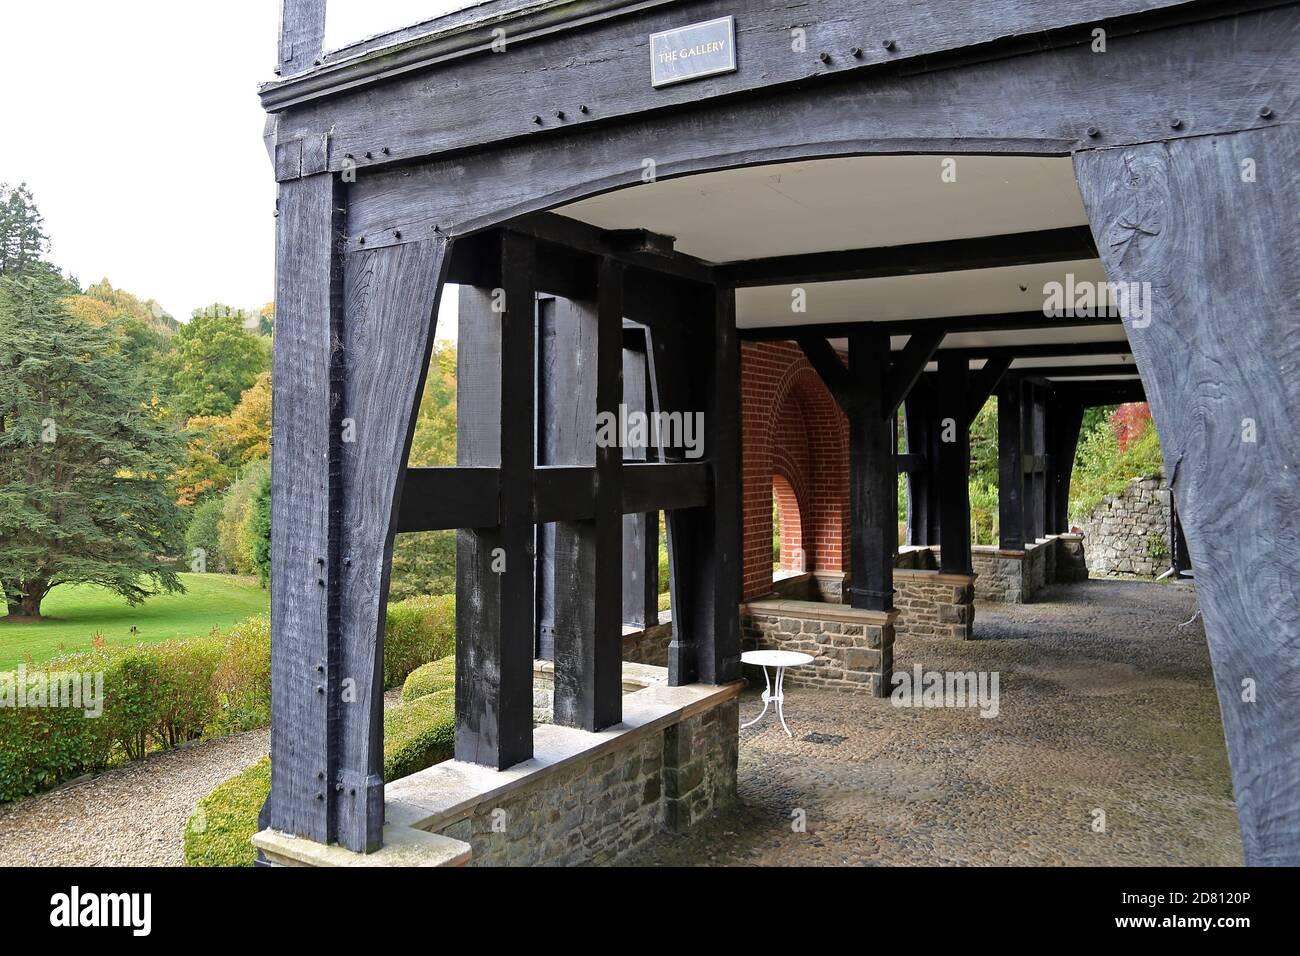 CAER Beris Manor Hotel and Restaurant, Builth Wells, Brecknockshire, Powys, pays de Galles, Grande-Bretagne, Royaume-Uni, Royaume-Uni, Europe Banque D'Images